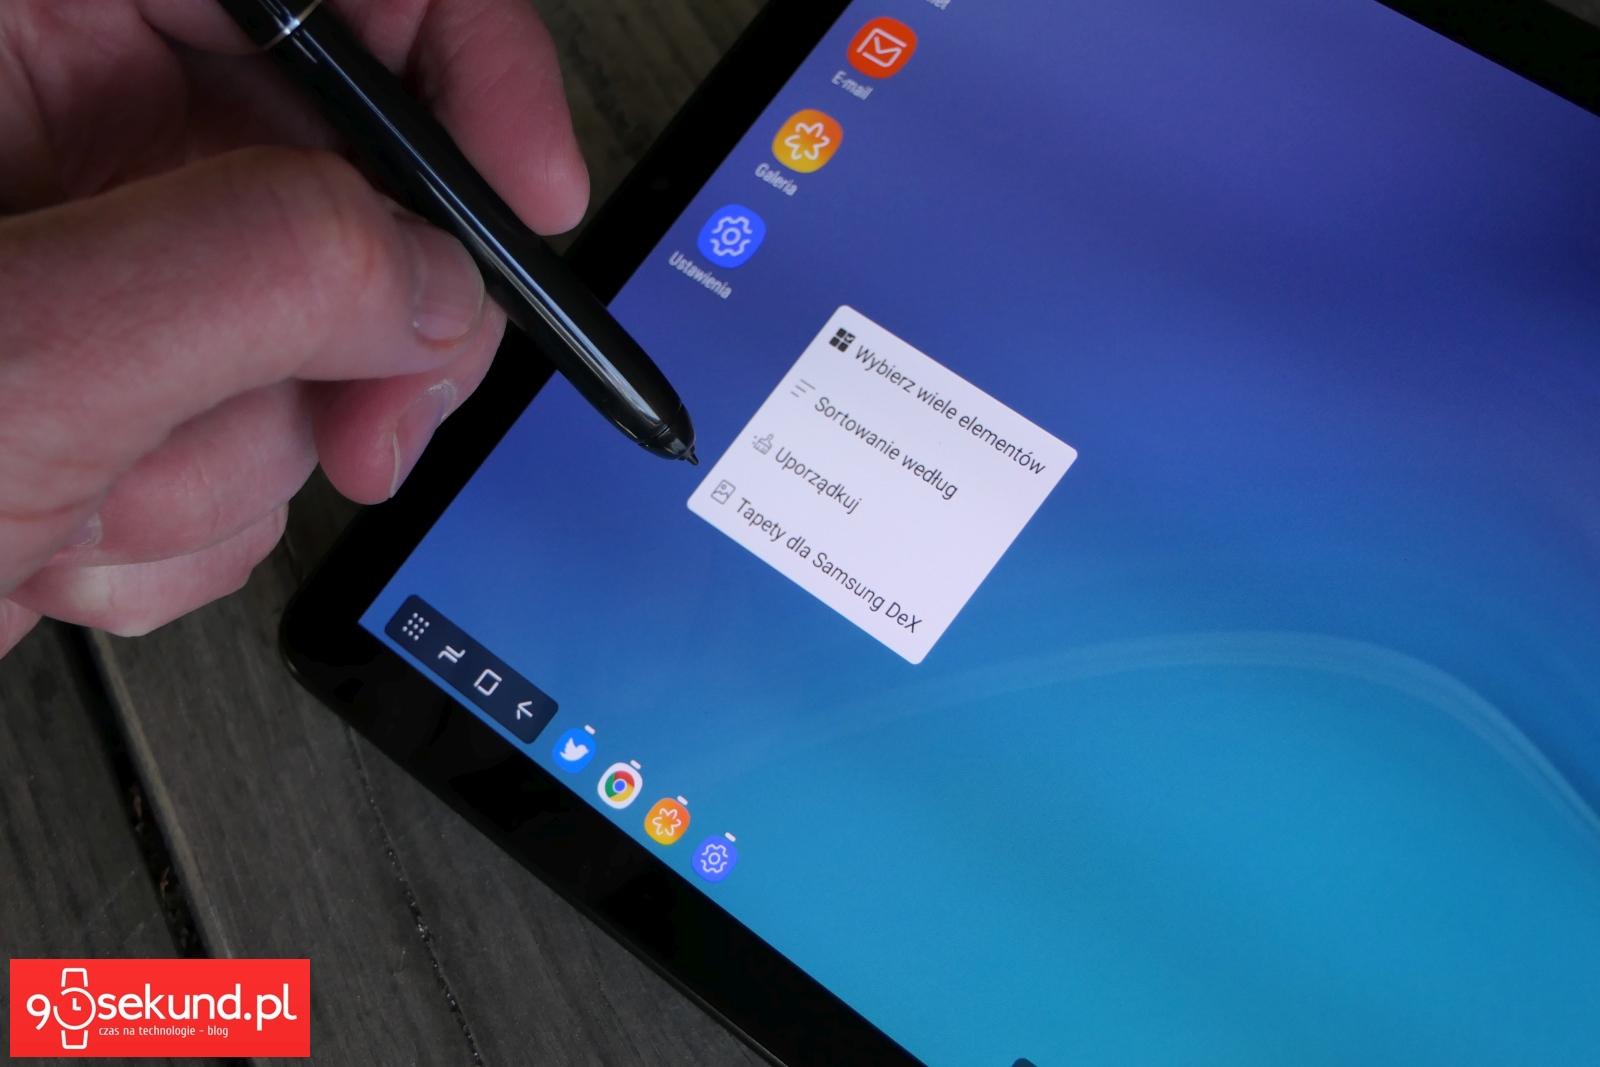 Recenzja tabletu Samsung Galaxy Tab S4 - Michał Brożyński - 90sekund.pl